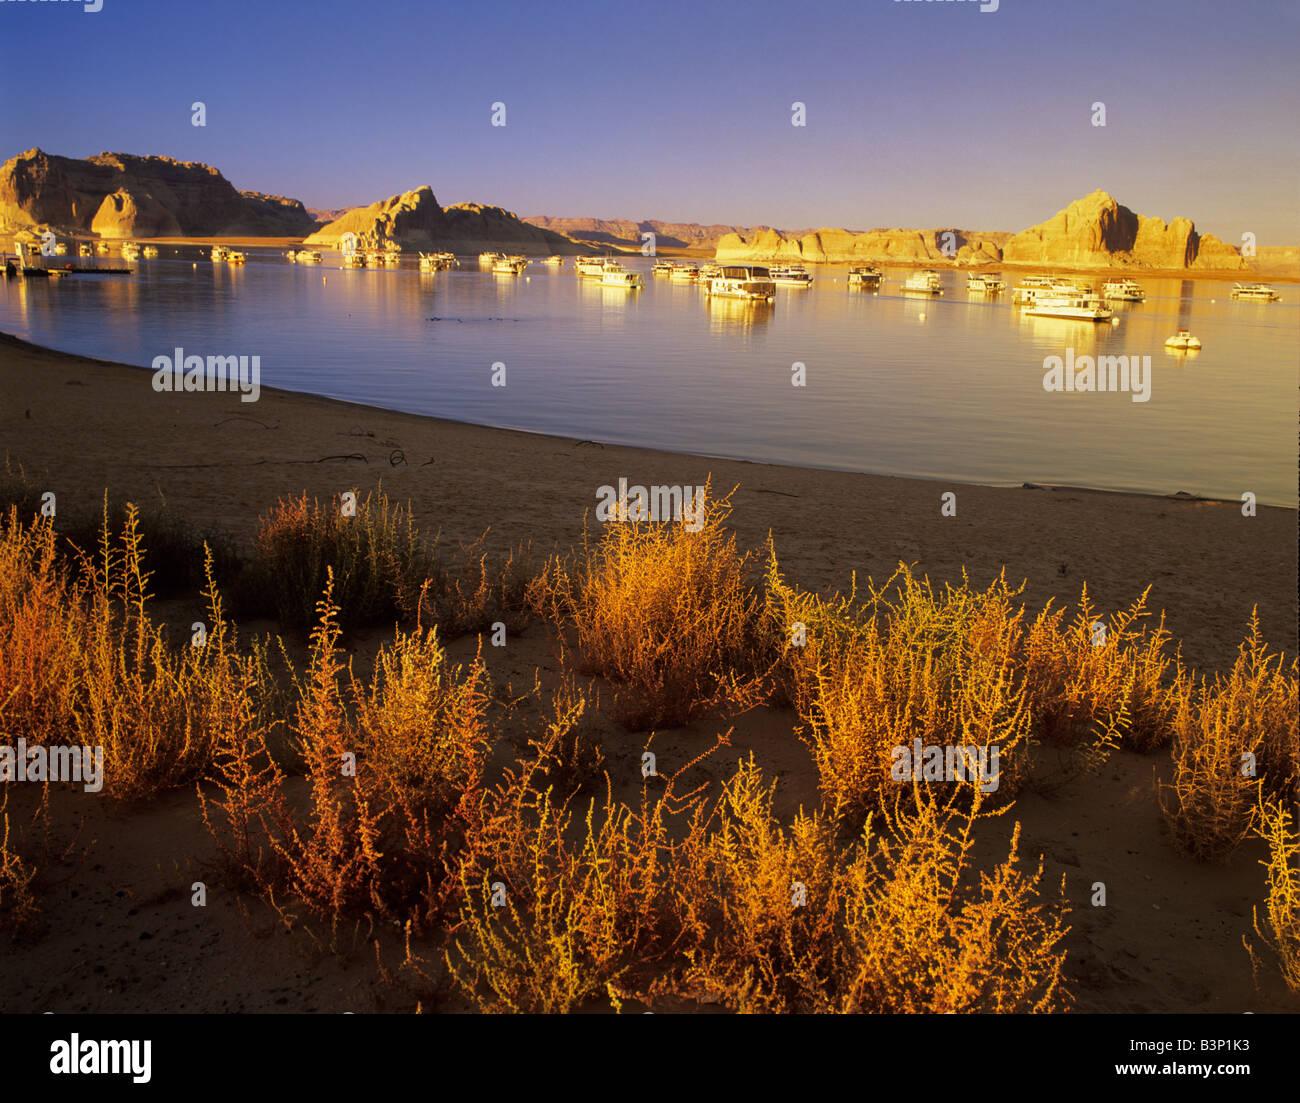 Marina Wahweap botes en el Lago Powell, Utah Imagen De Stock